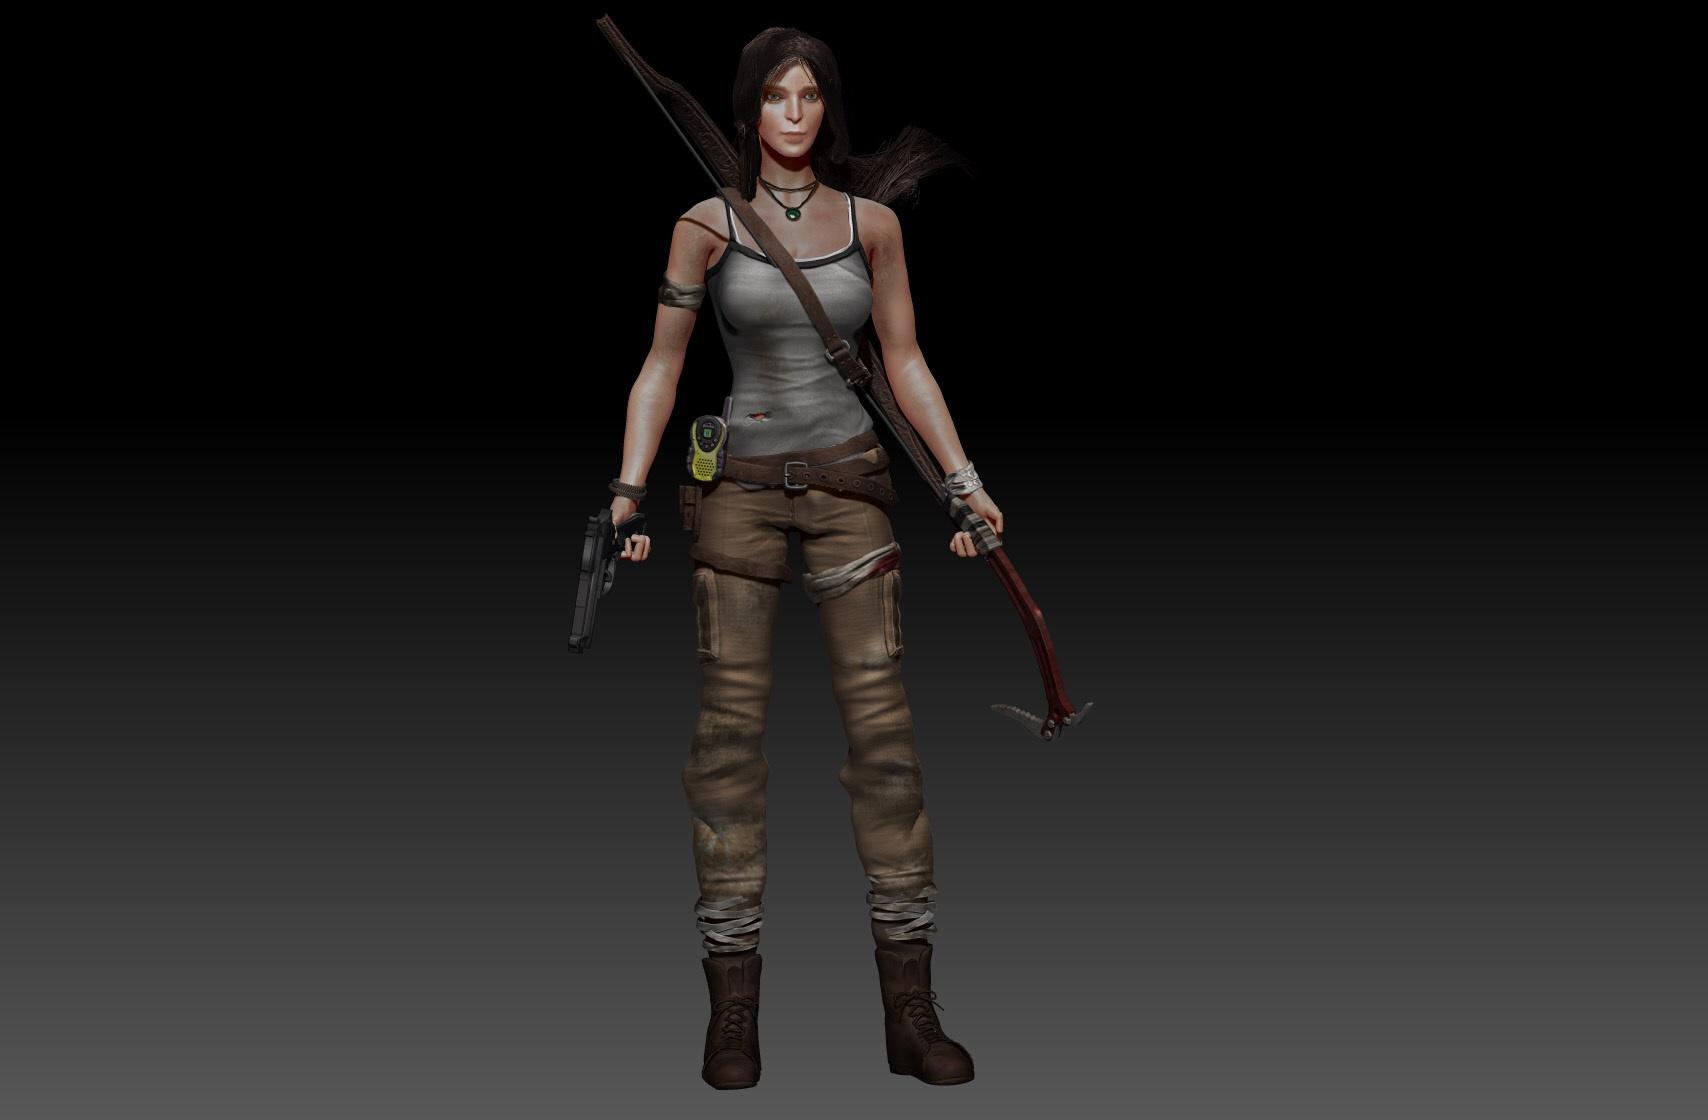 Tomb Raider 2013 Version Wip